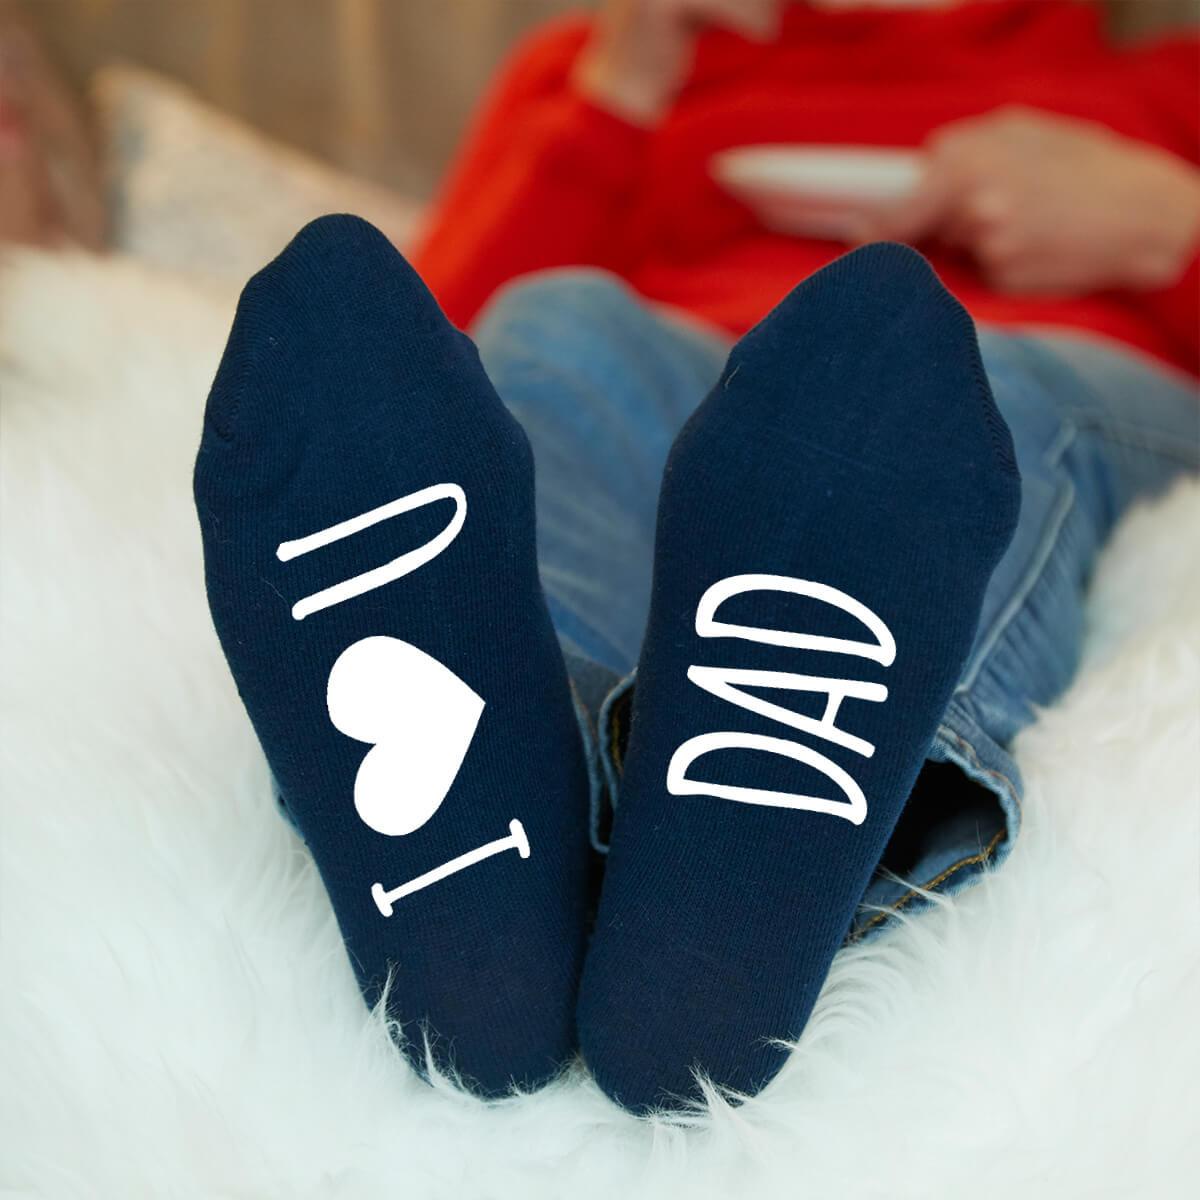 I Heart You Personalised Socks